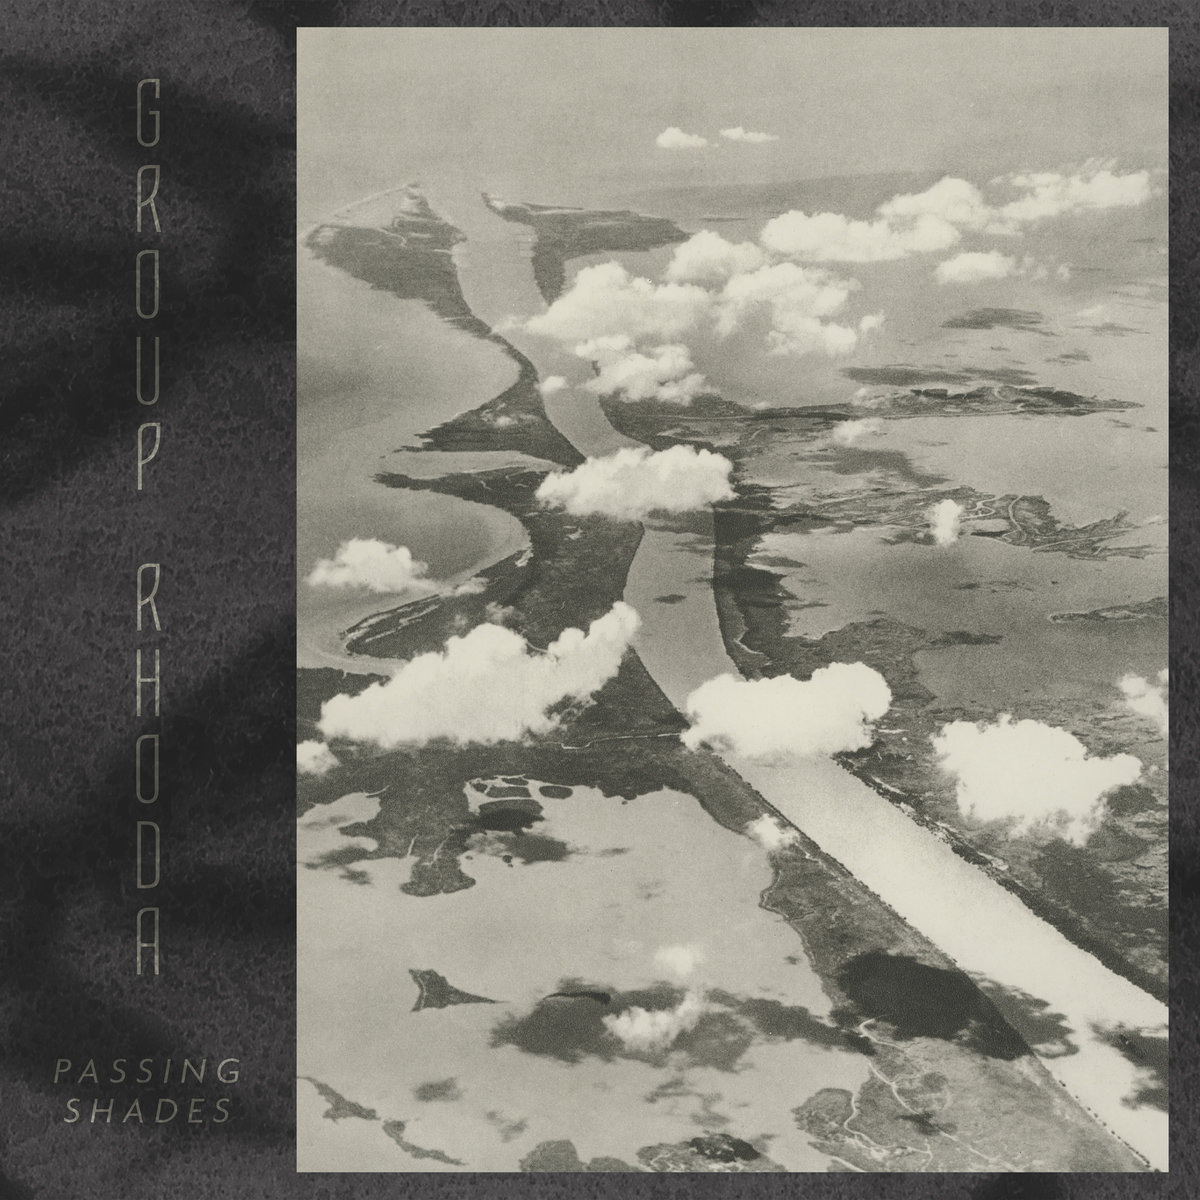 Group Rhoda - Passing Shades (LP, 2020)